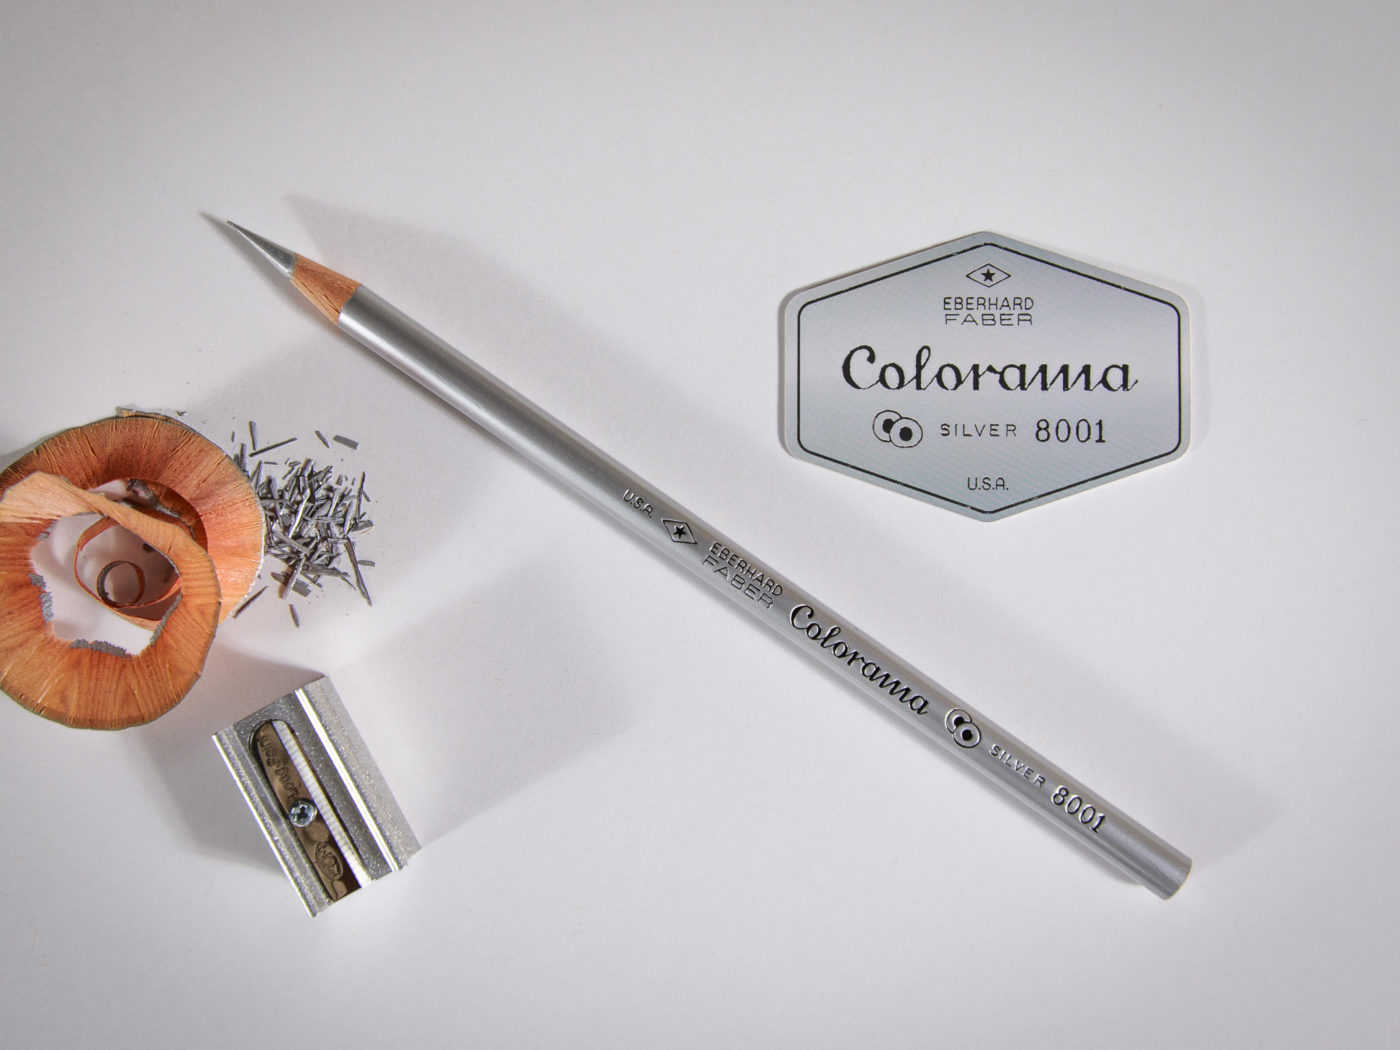 Eberhard Faber Colorama Silver vintage colored pencil